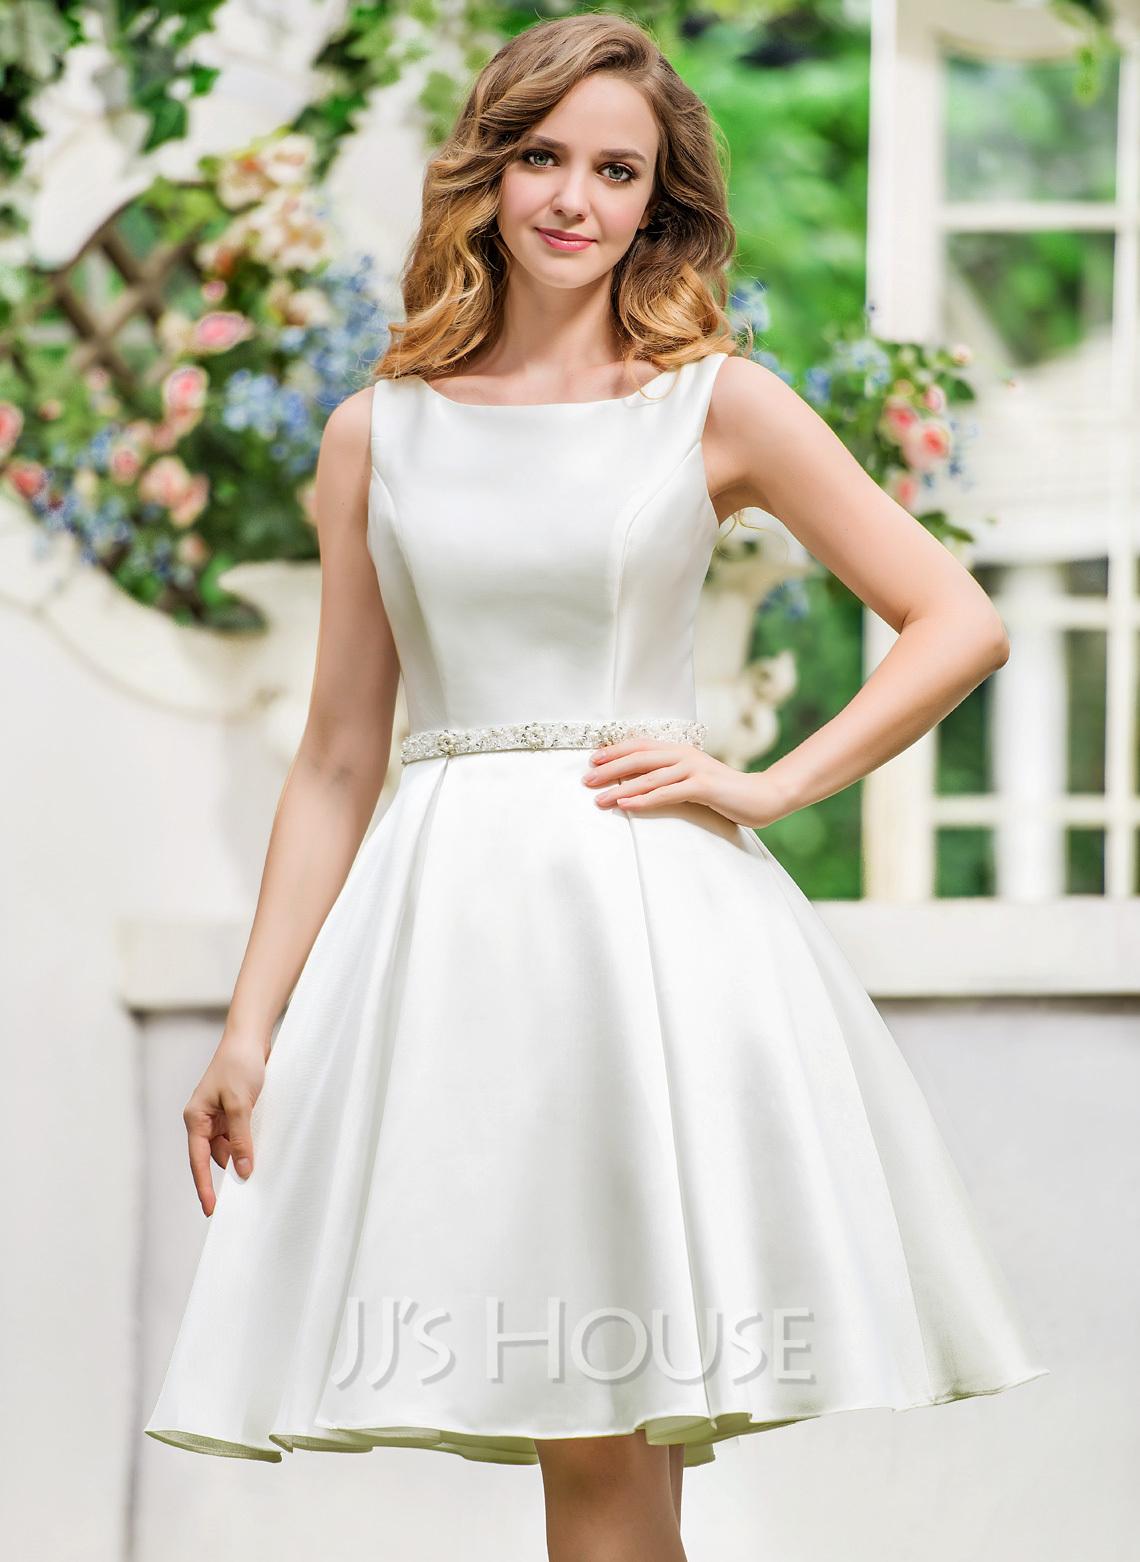 A-Line/Princess Scoop Neck Knee-Length Satin Wedding Dress With Beading Sequins